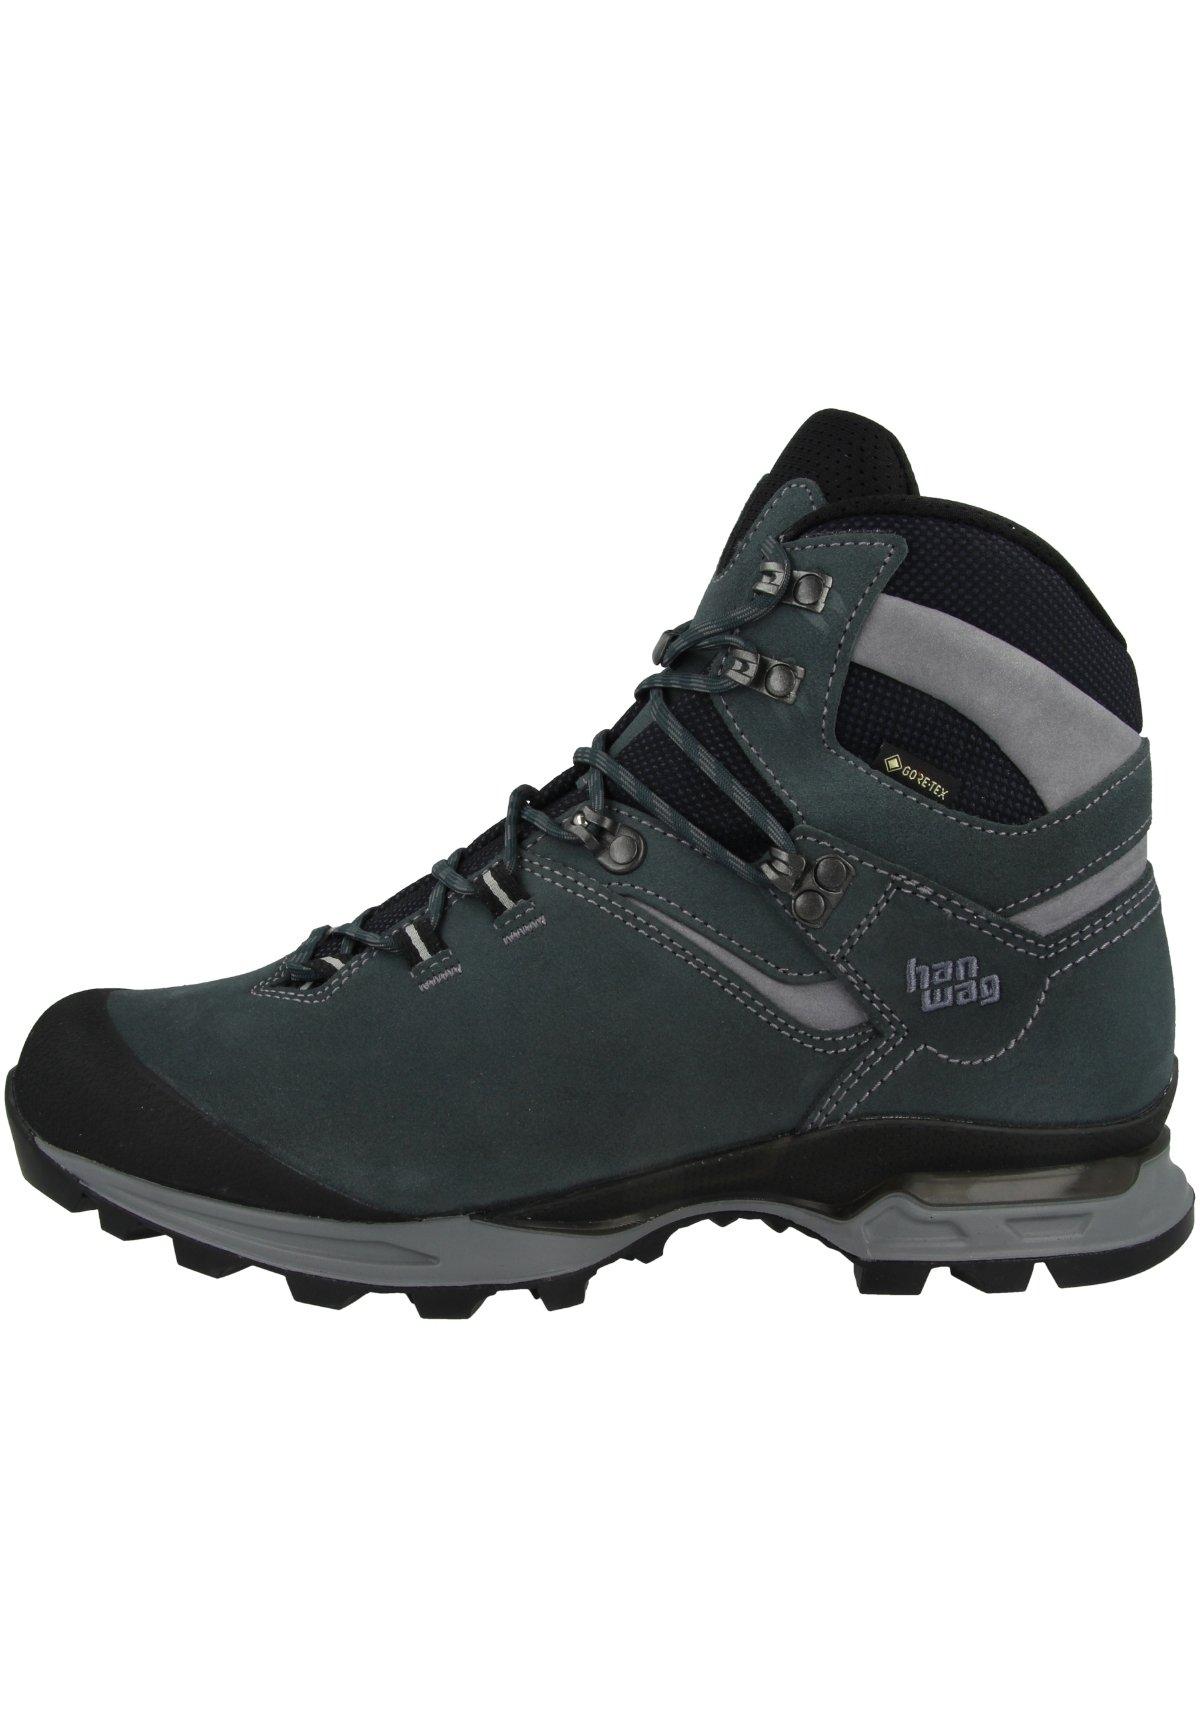 Herren Hikingschuh - dusk-light grey